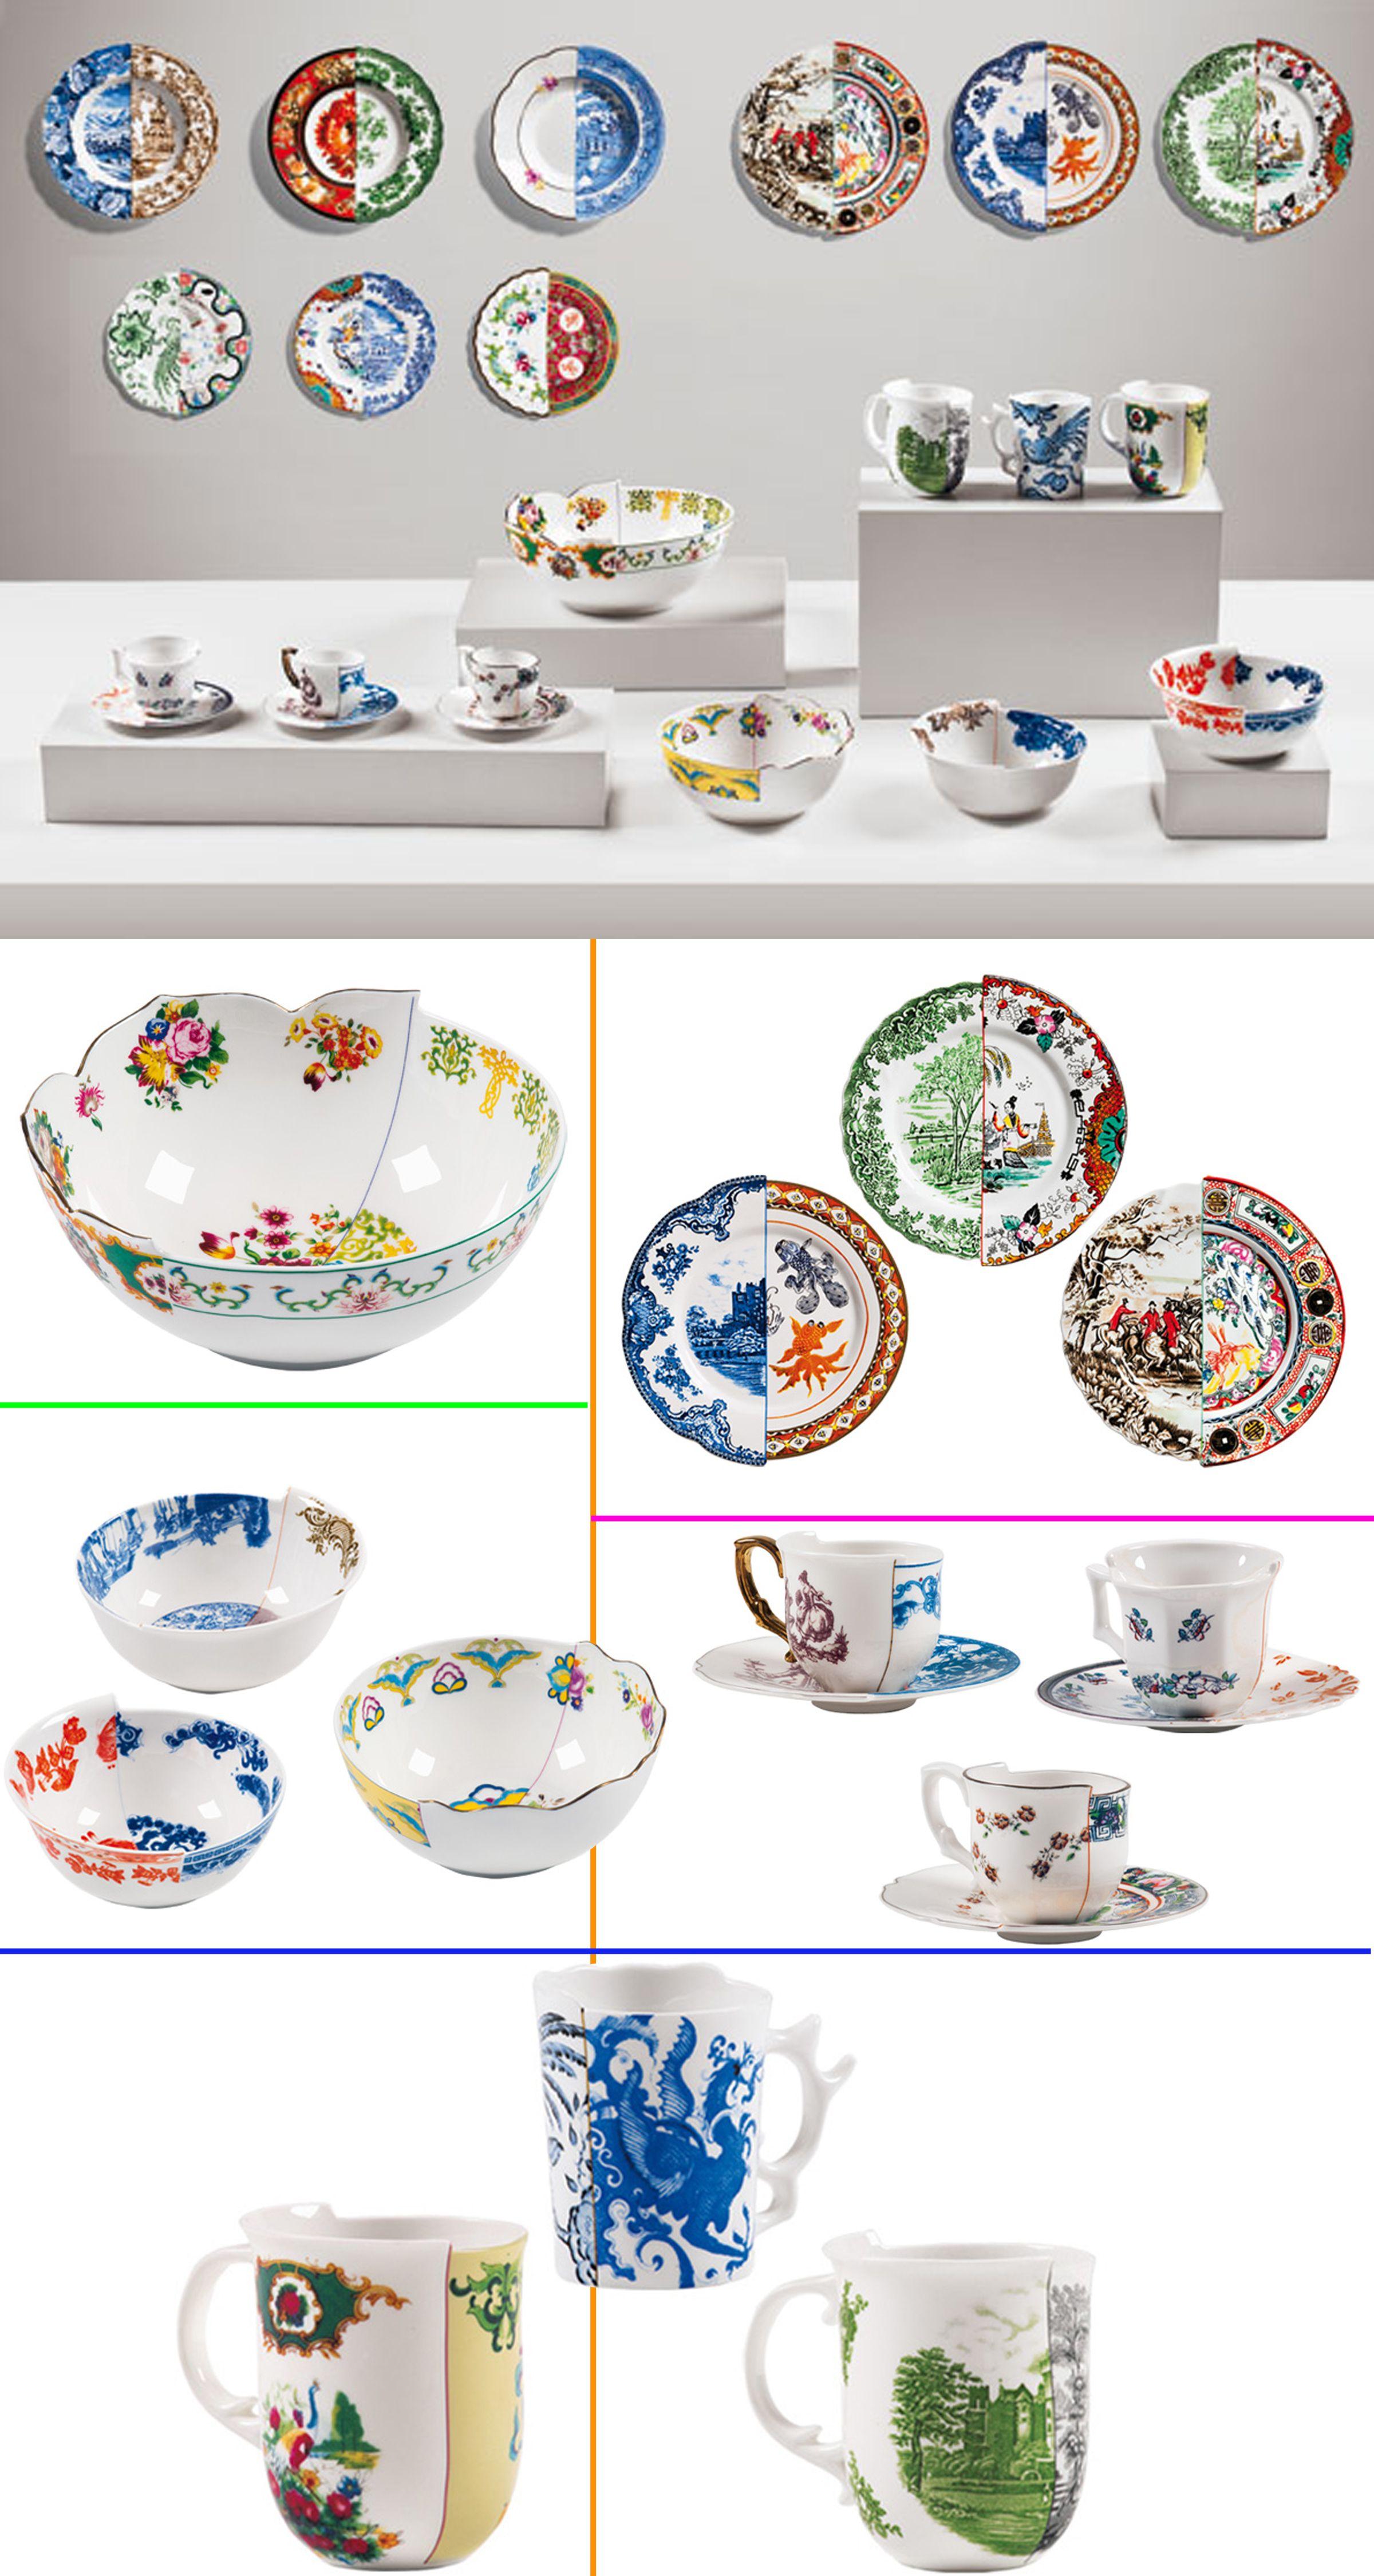 Seletti hybrid china talking about me pinterest kitchen seletti hybrid china gumiabroncs Images